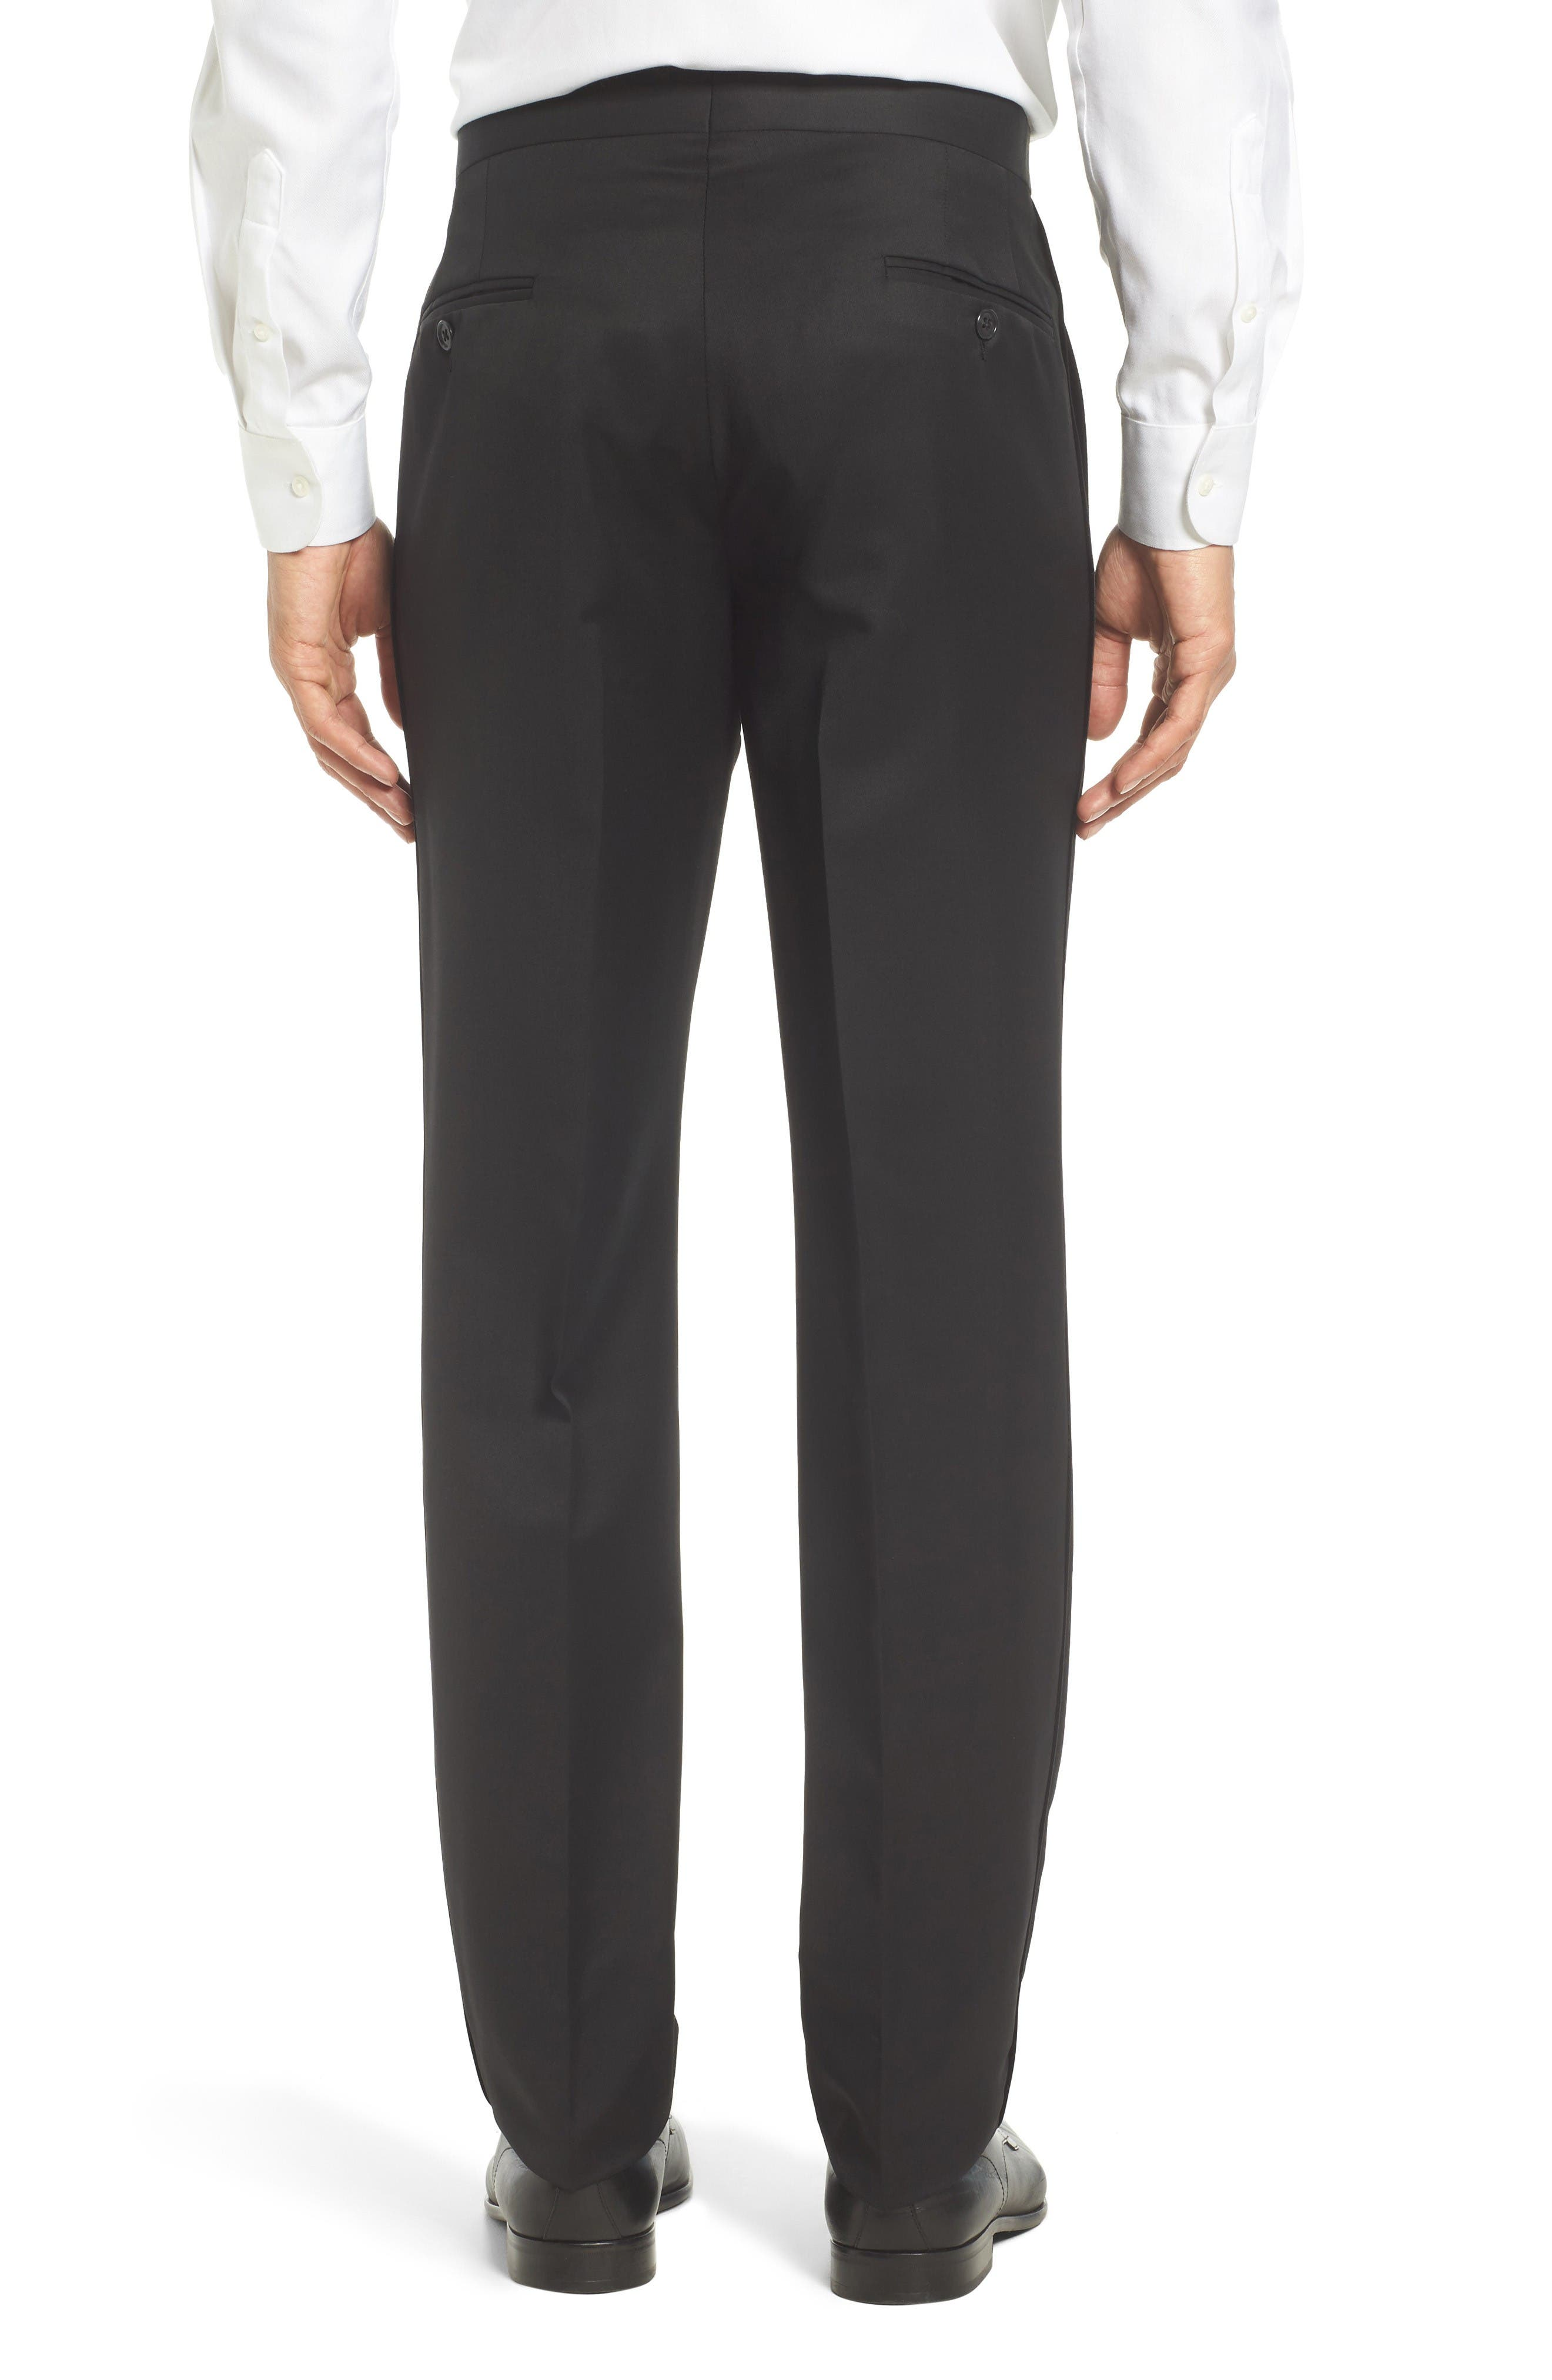 Josh Flat Front Wool & Mohair Tuxedo Pants,                             Alternate thumbnail 2, color,                             Black